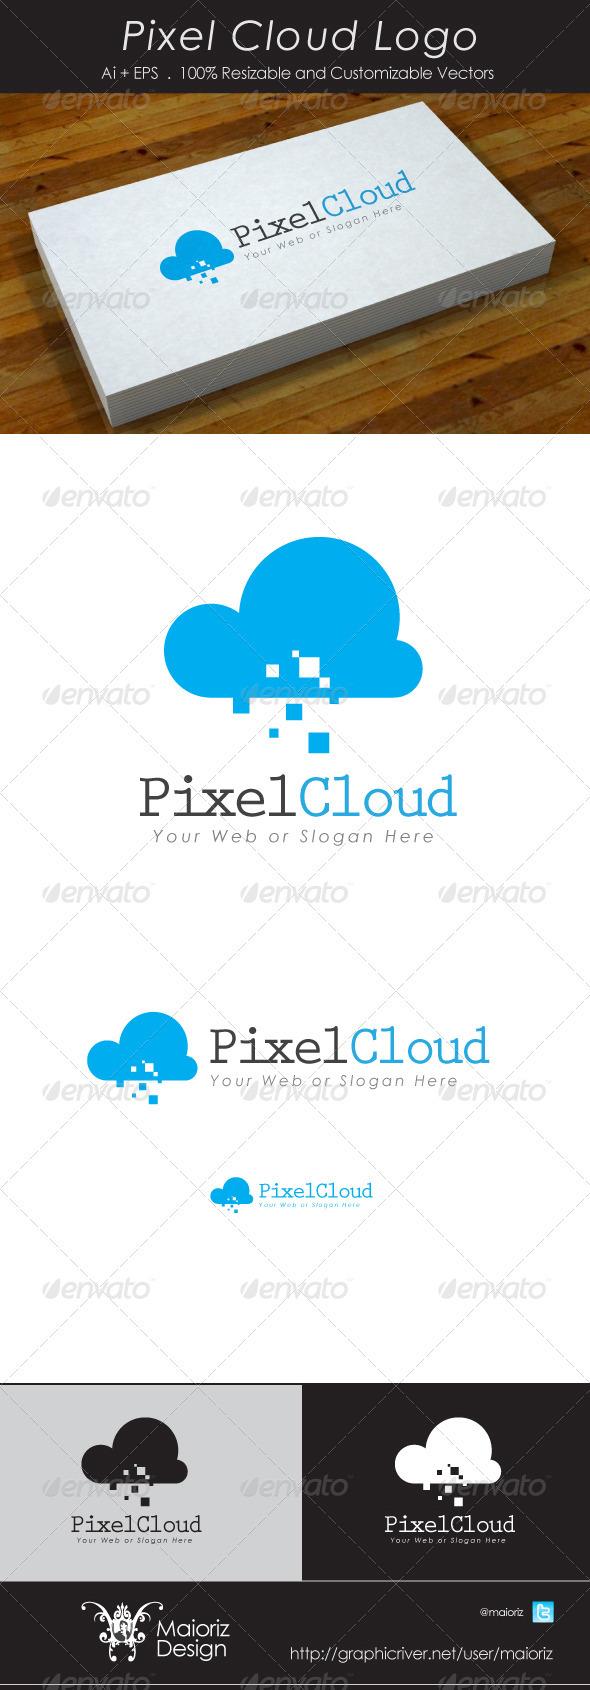 GraphicRiver Pixel Cloud Logotype 3511554